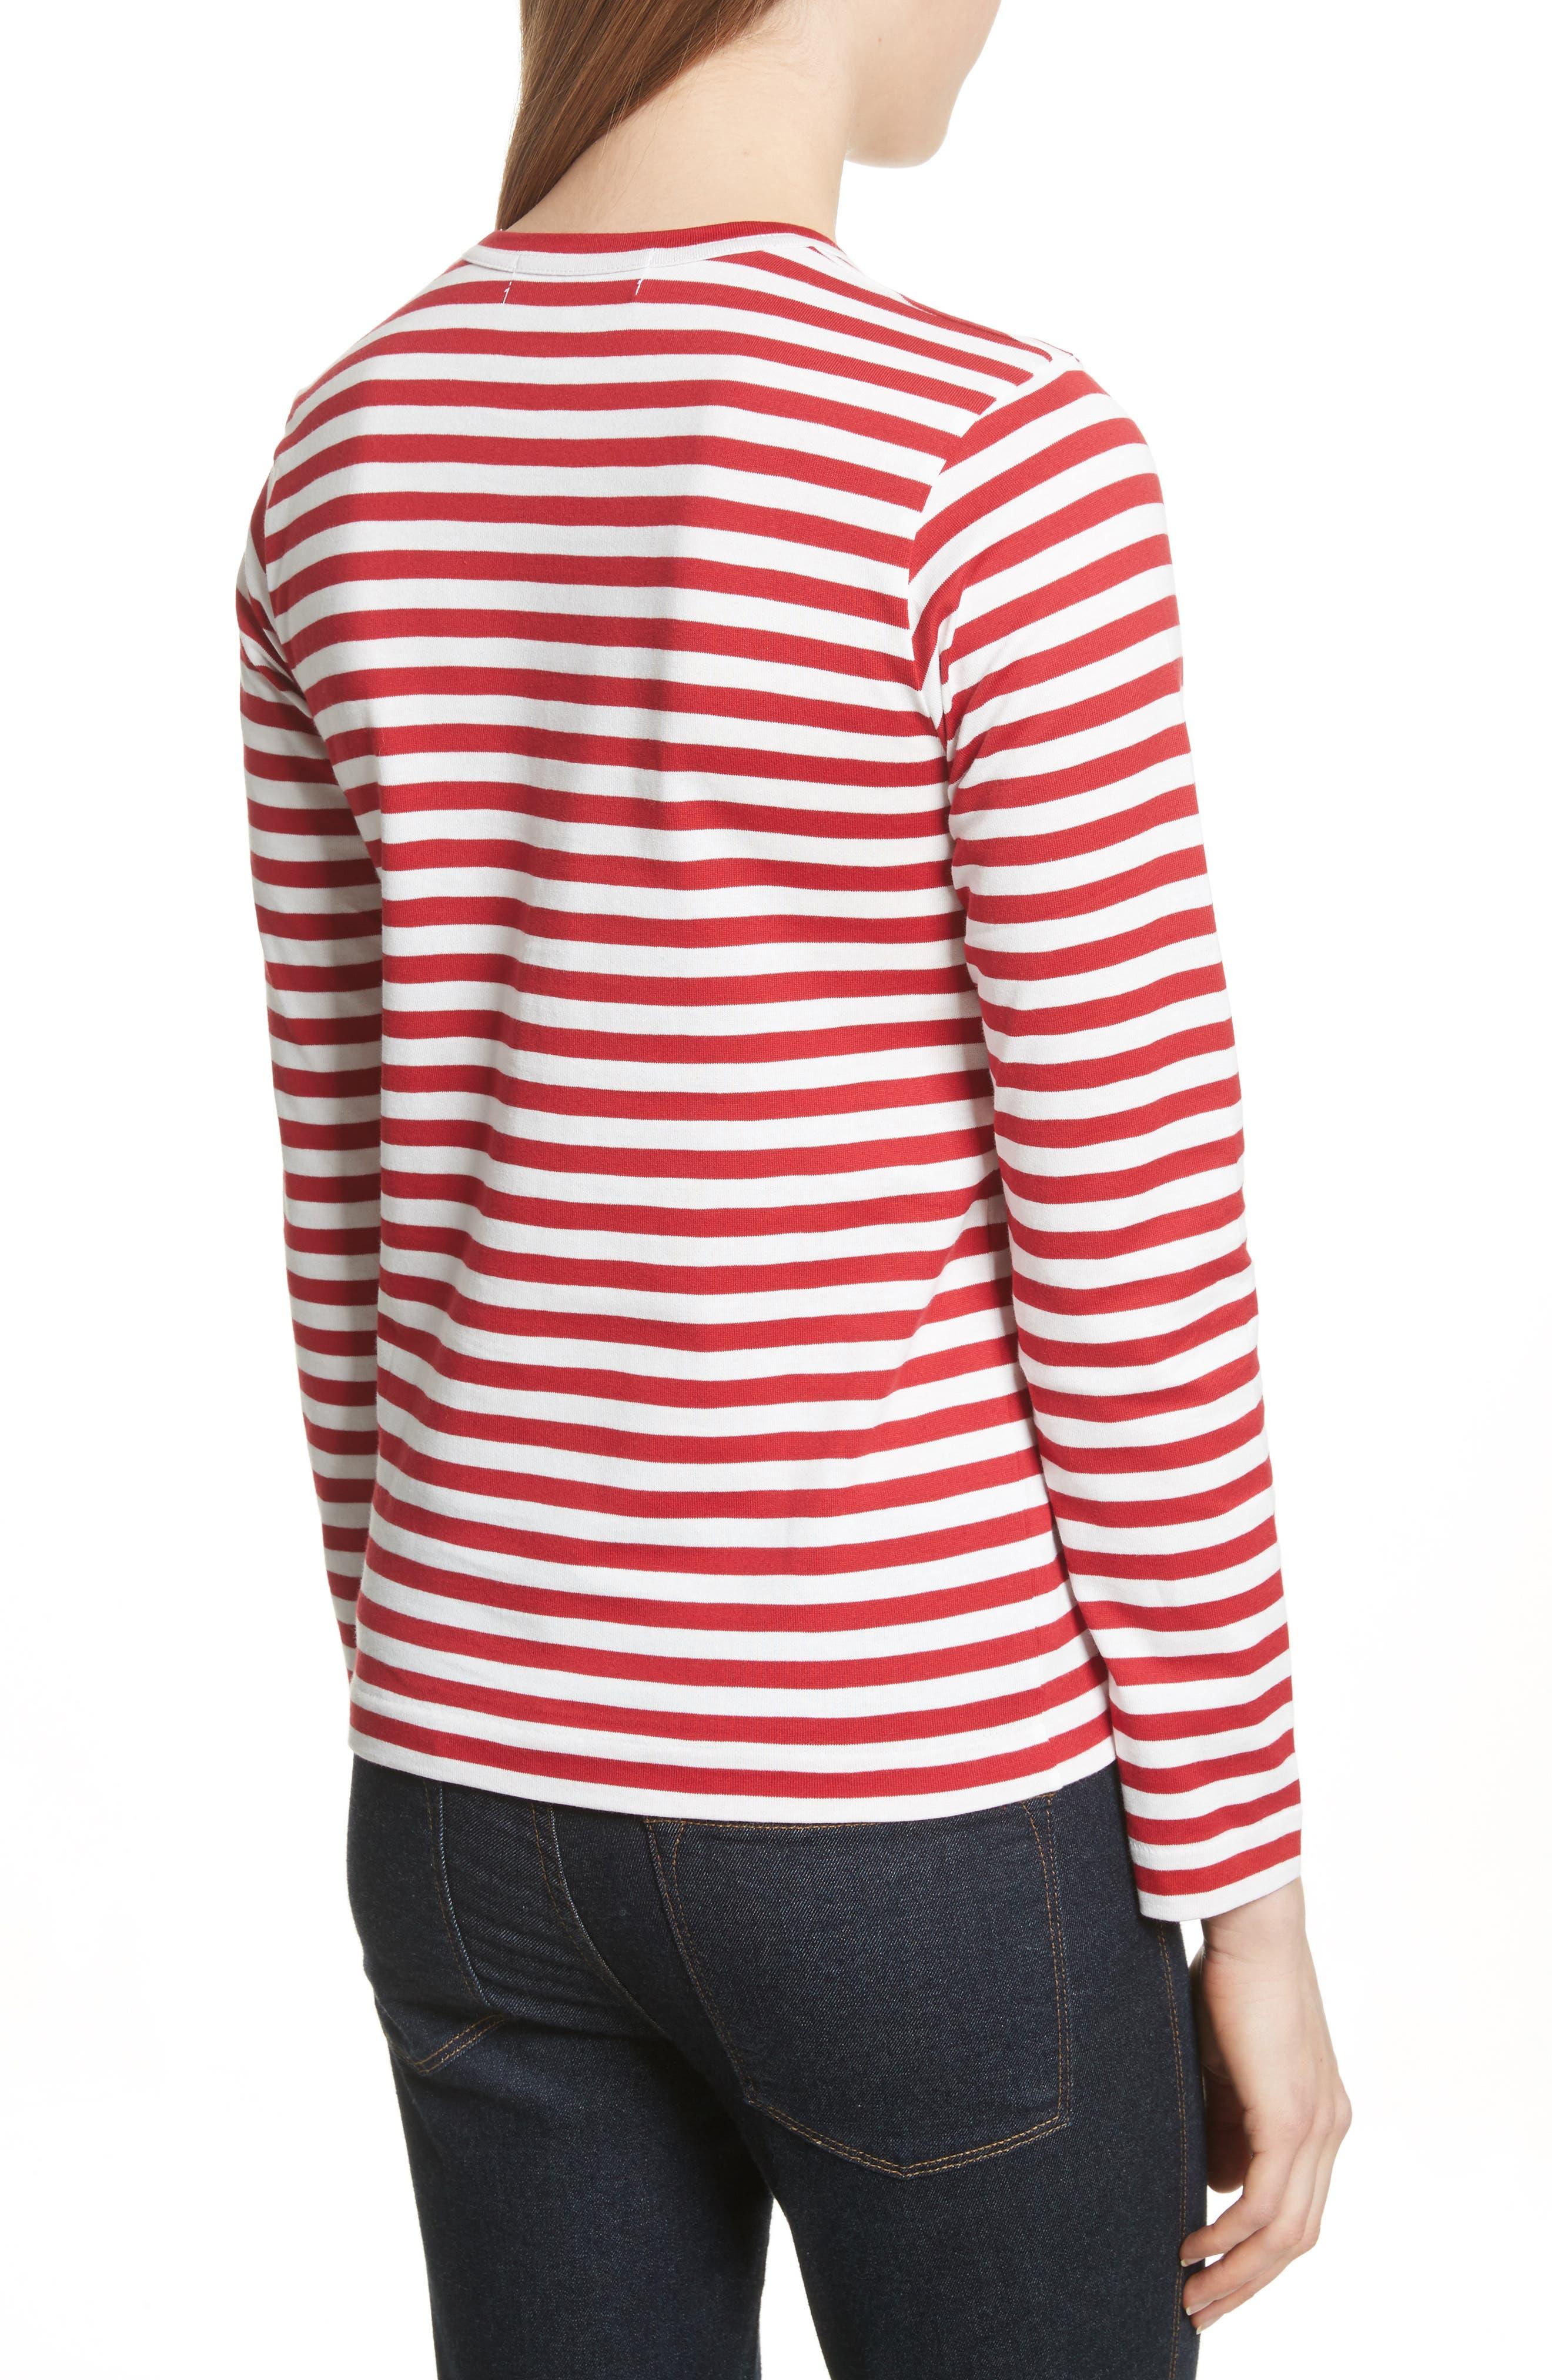 Stripe Cotton Tee,                             Alternate thumbnail 2, color,                             RED/ WHITE